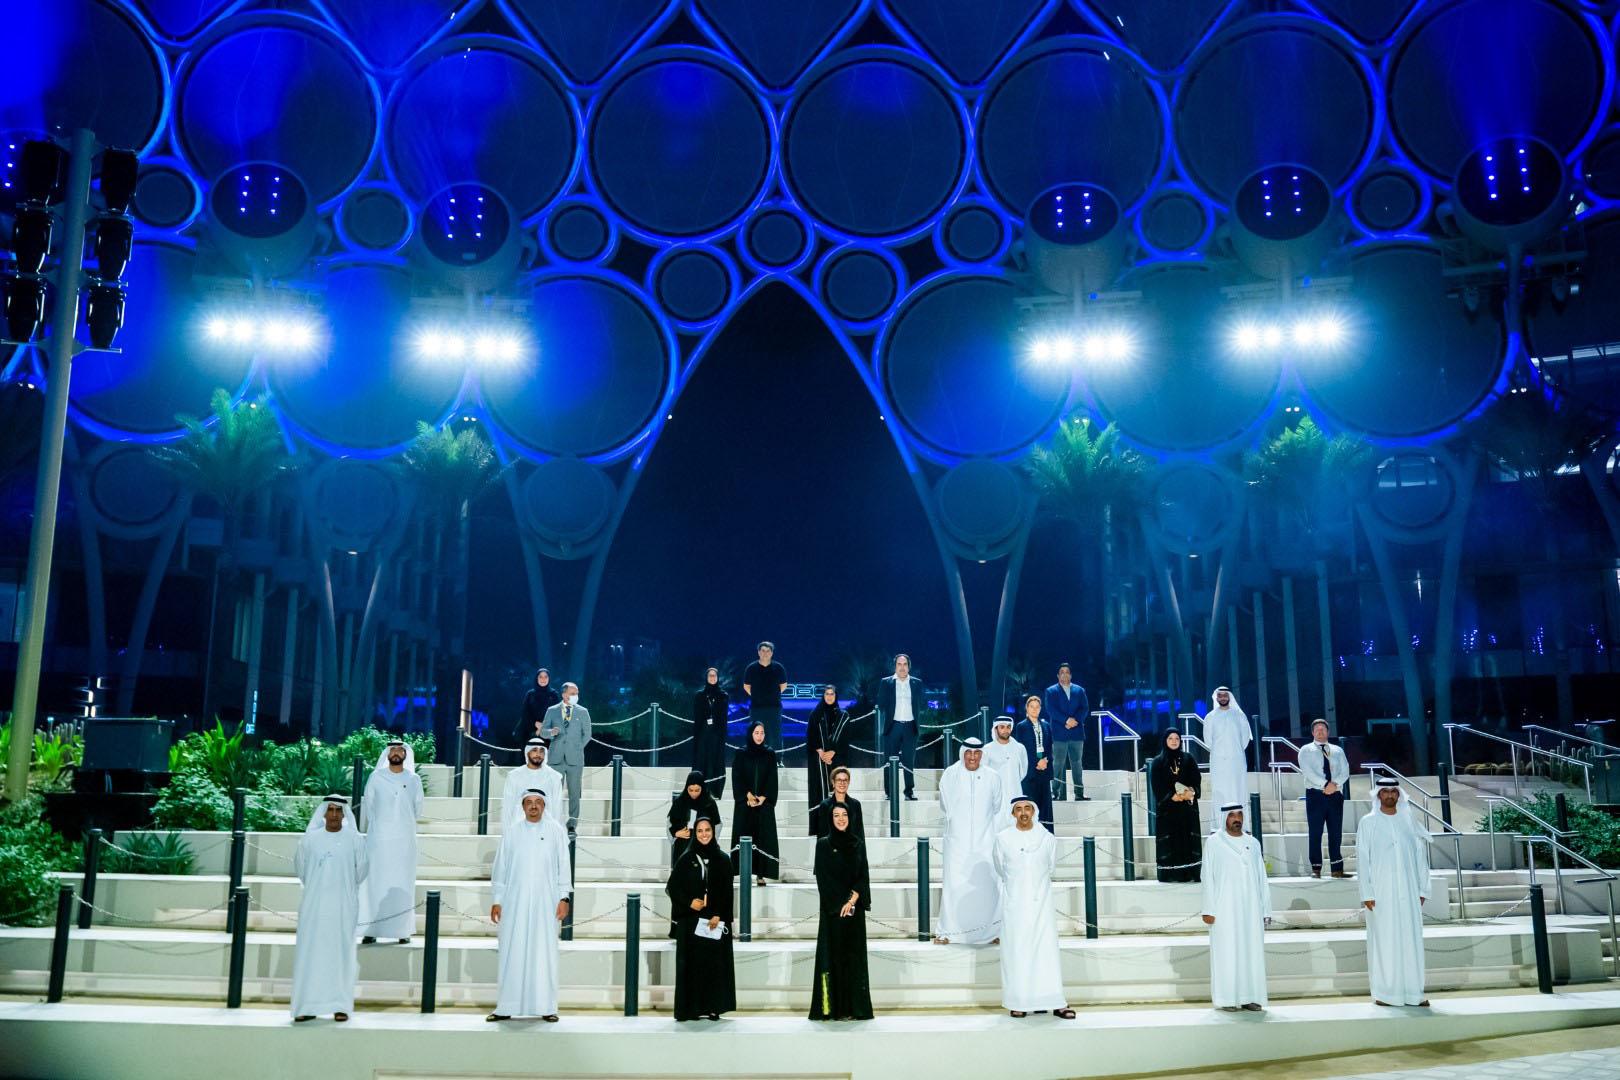 H.H. Sheikh Abdullah bin Zayed Al Nahyan visiting Expo 2020 site